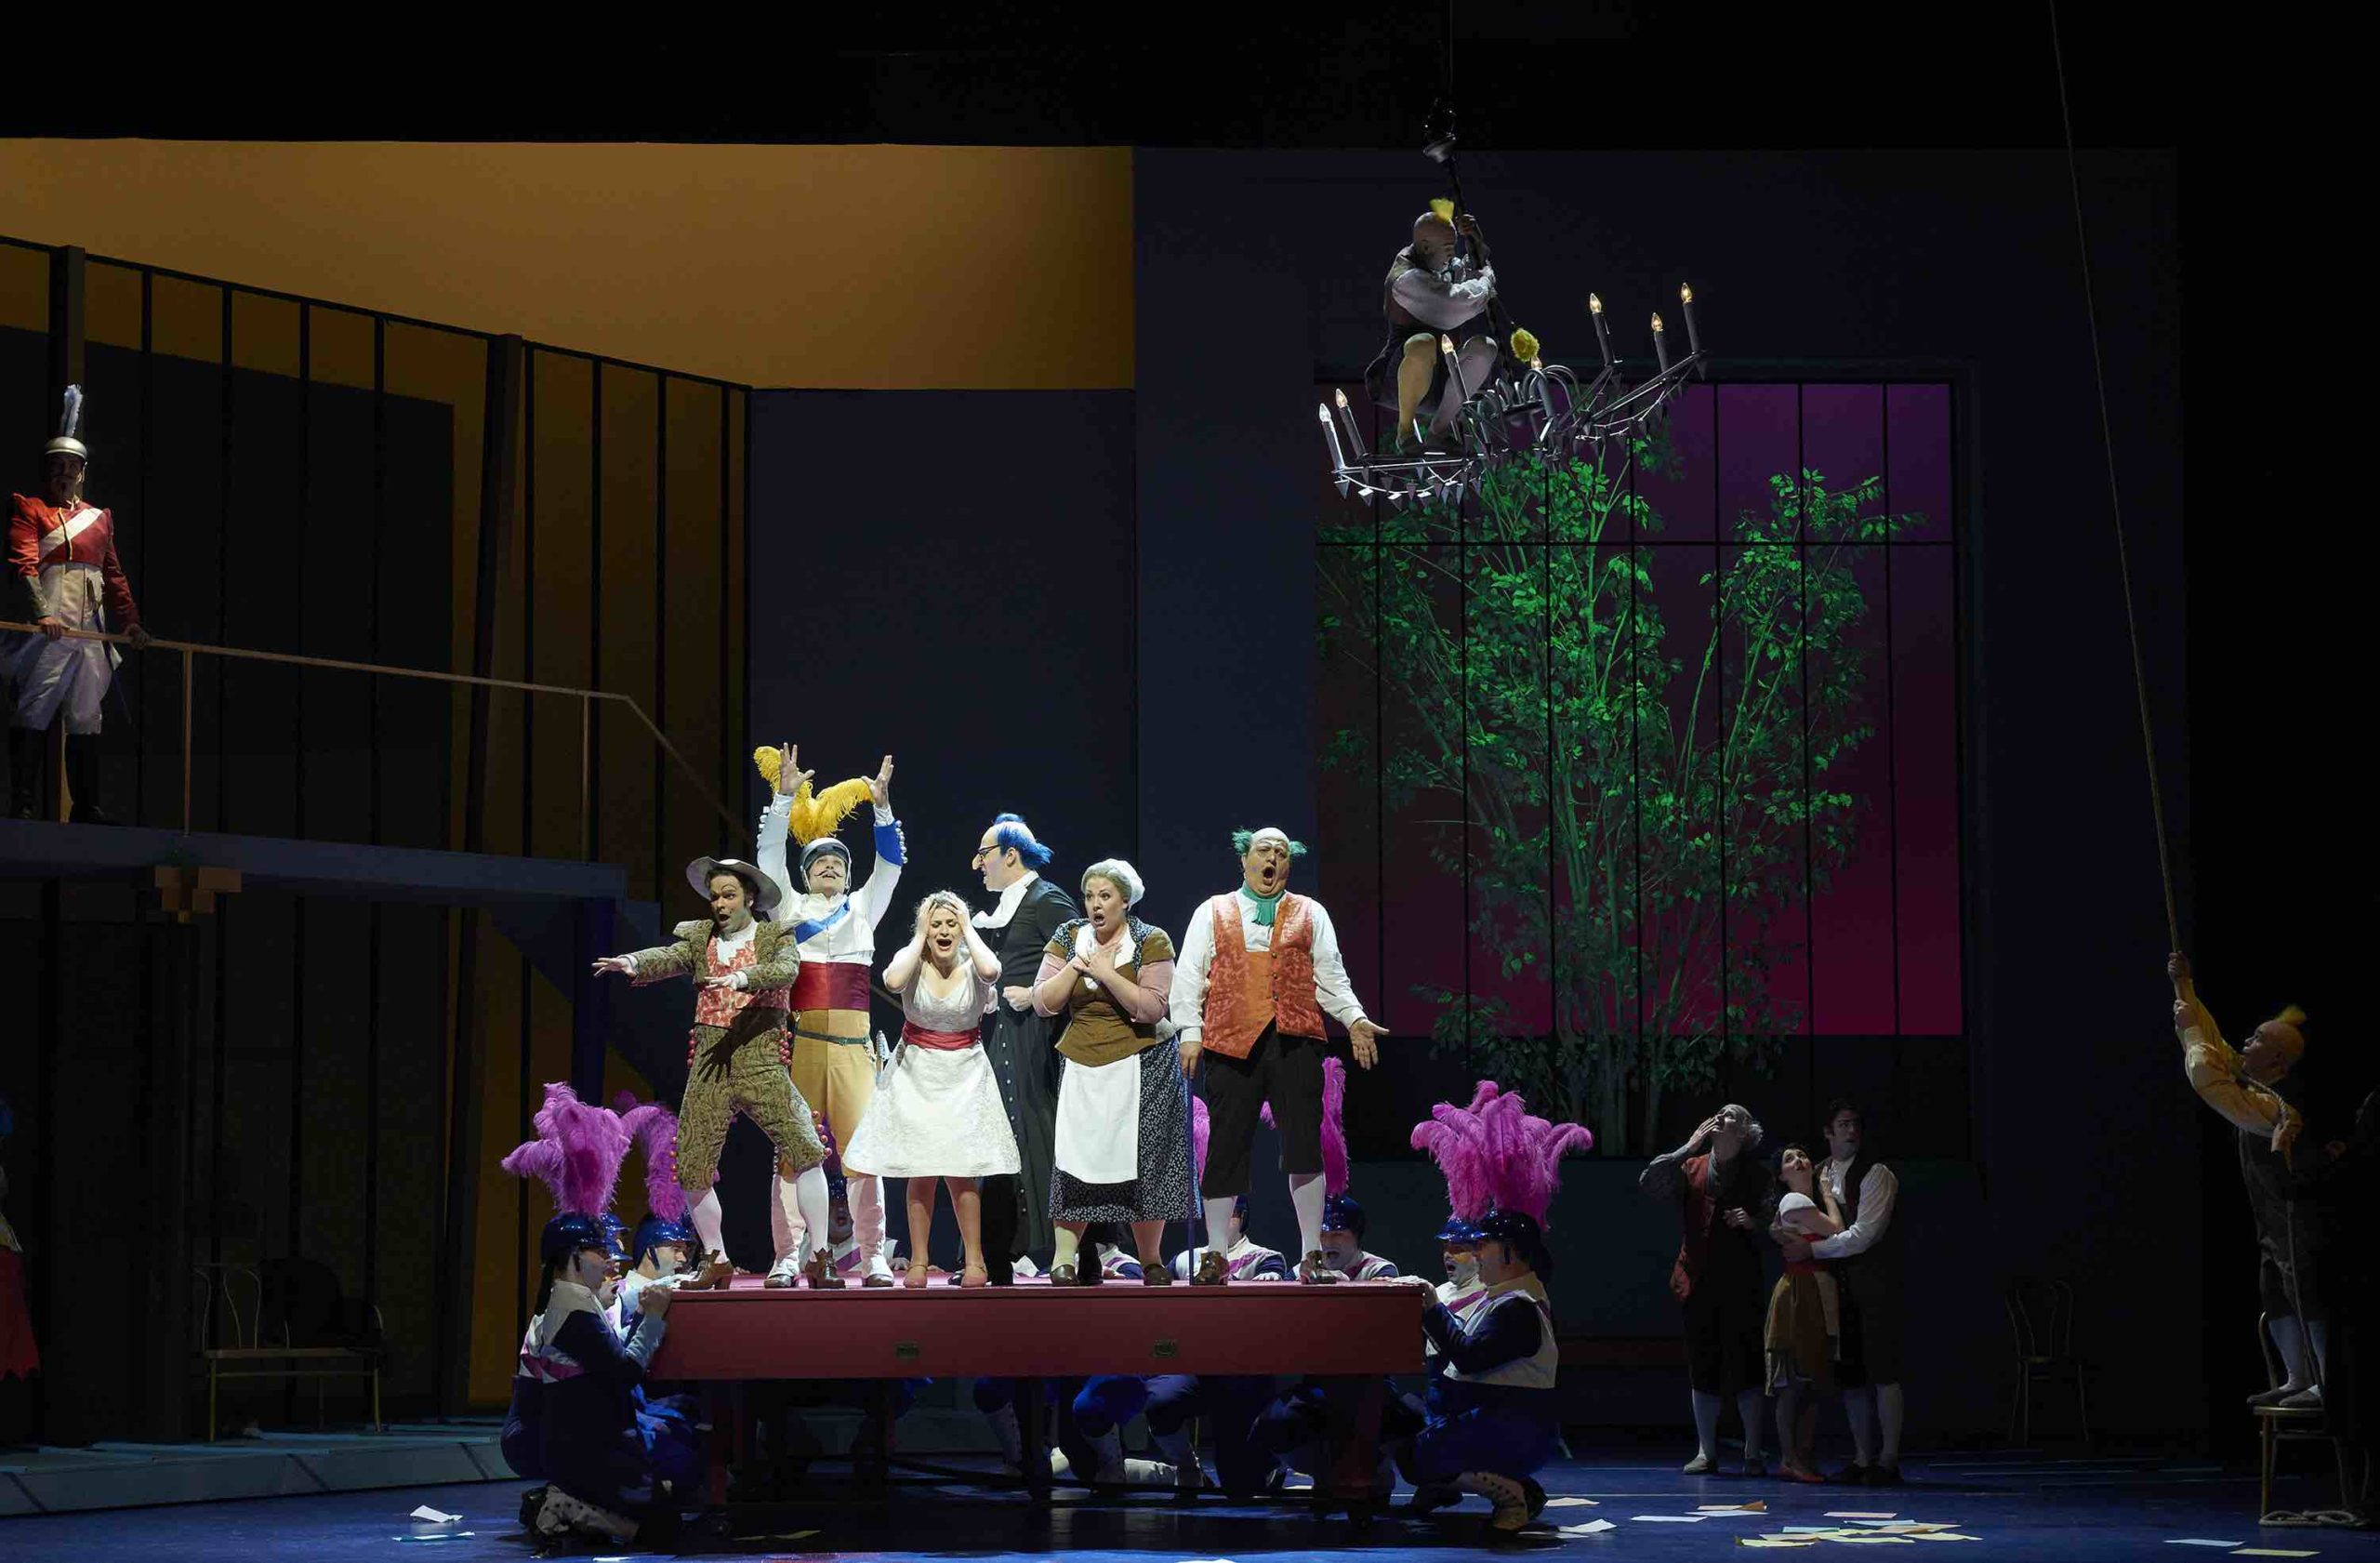 http://www.luxuryyorkville.com/canadian-opera-company-2020